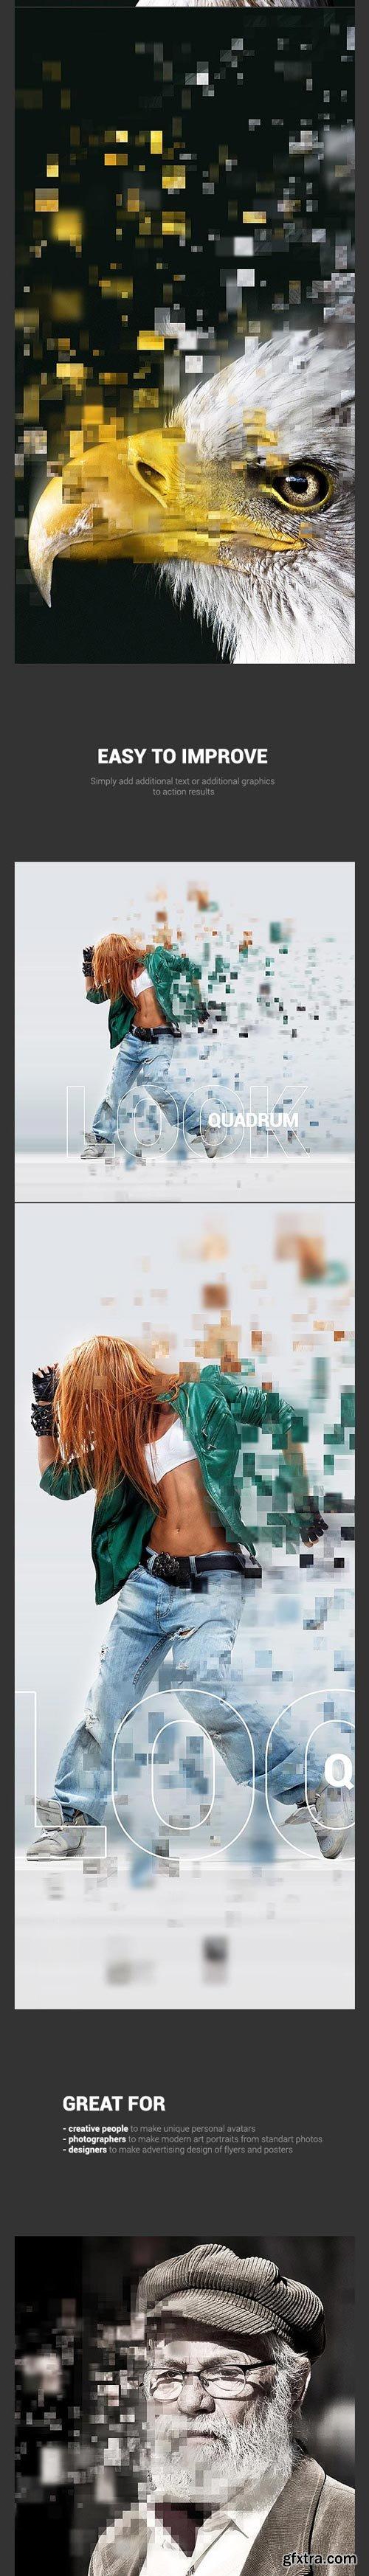 GraphicRiver - Quadrum PS Action - 12029373